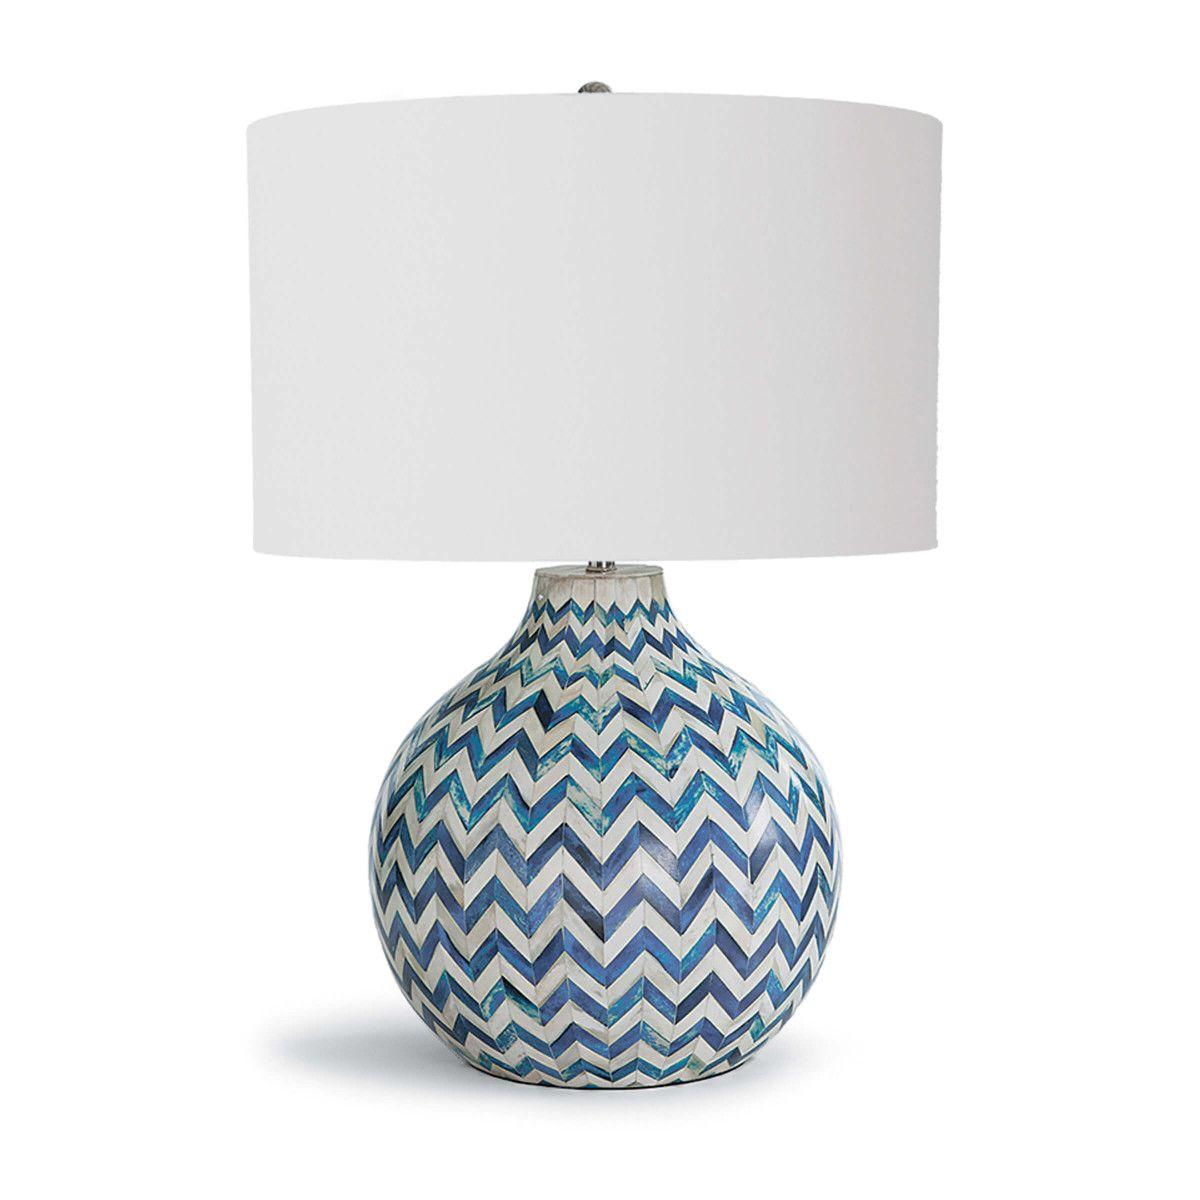 Chevron bone table lamp regina andrew